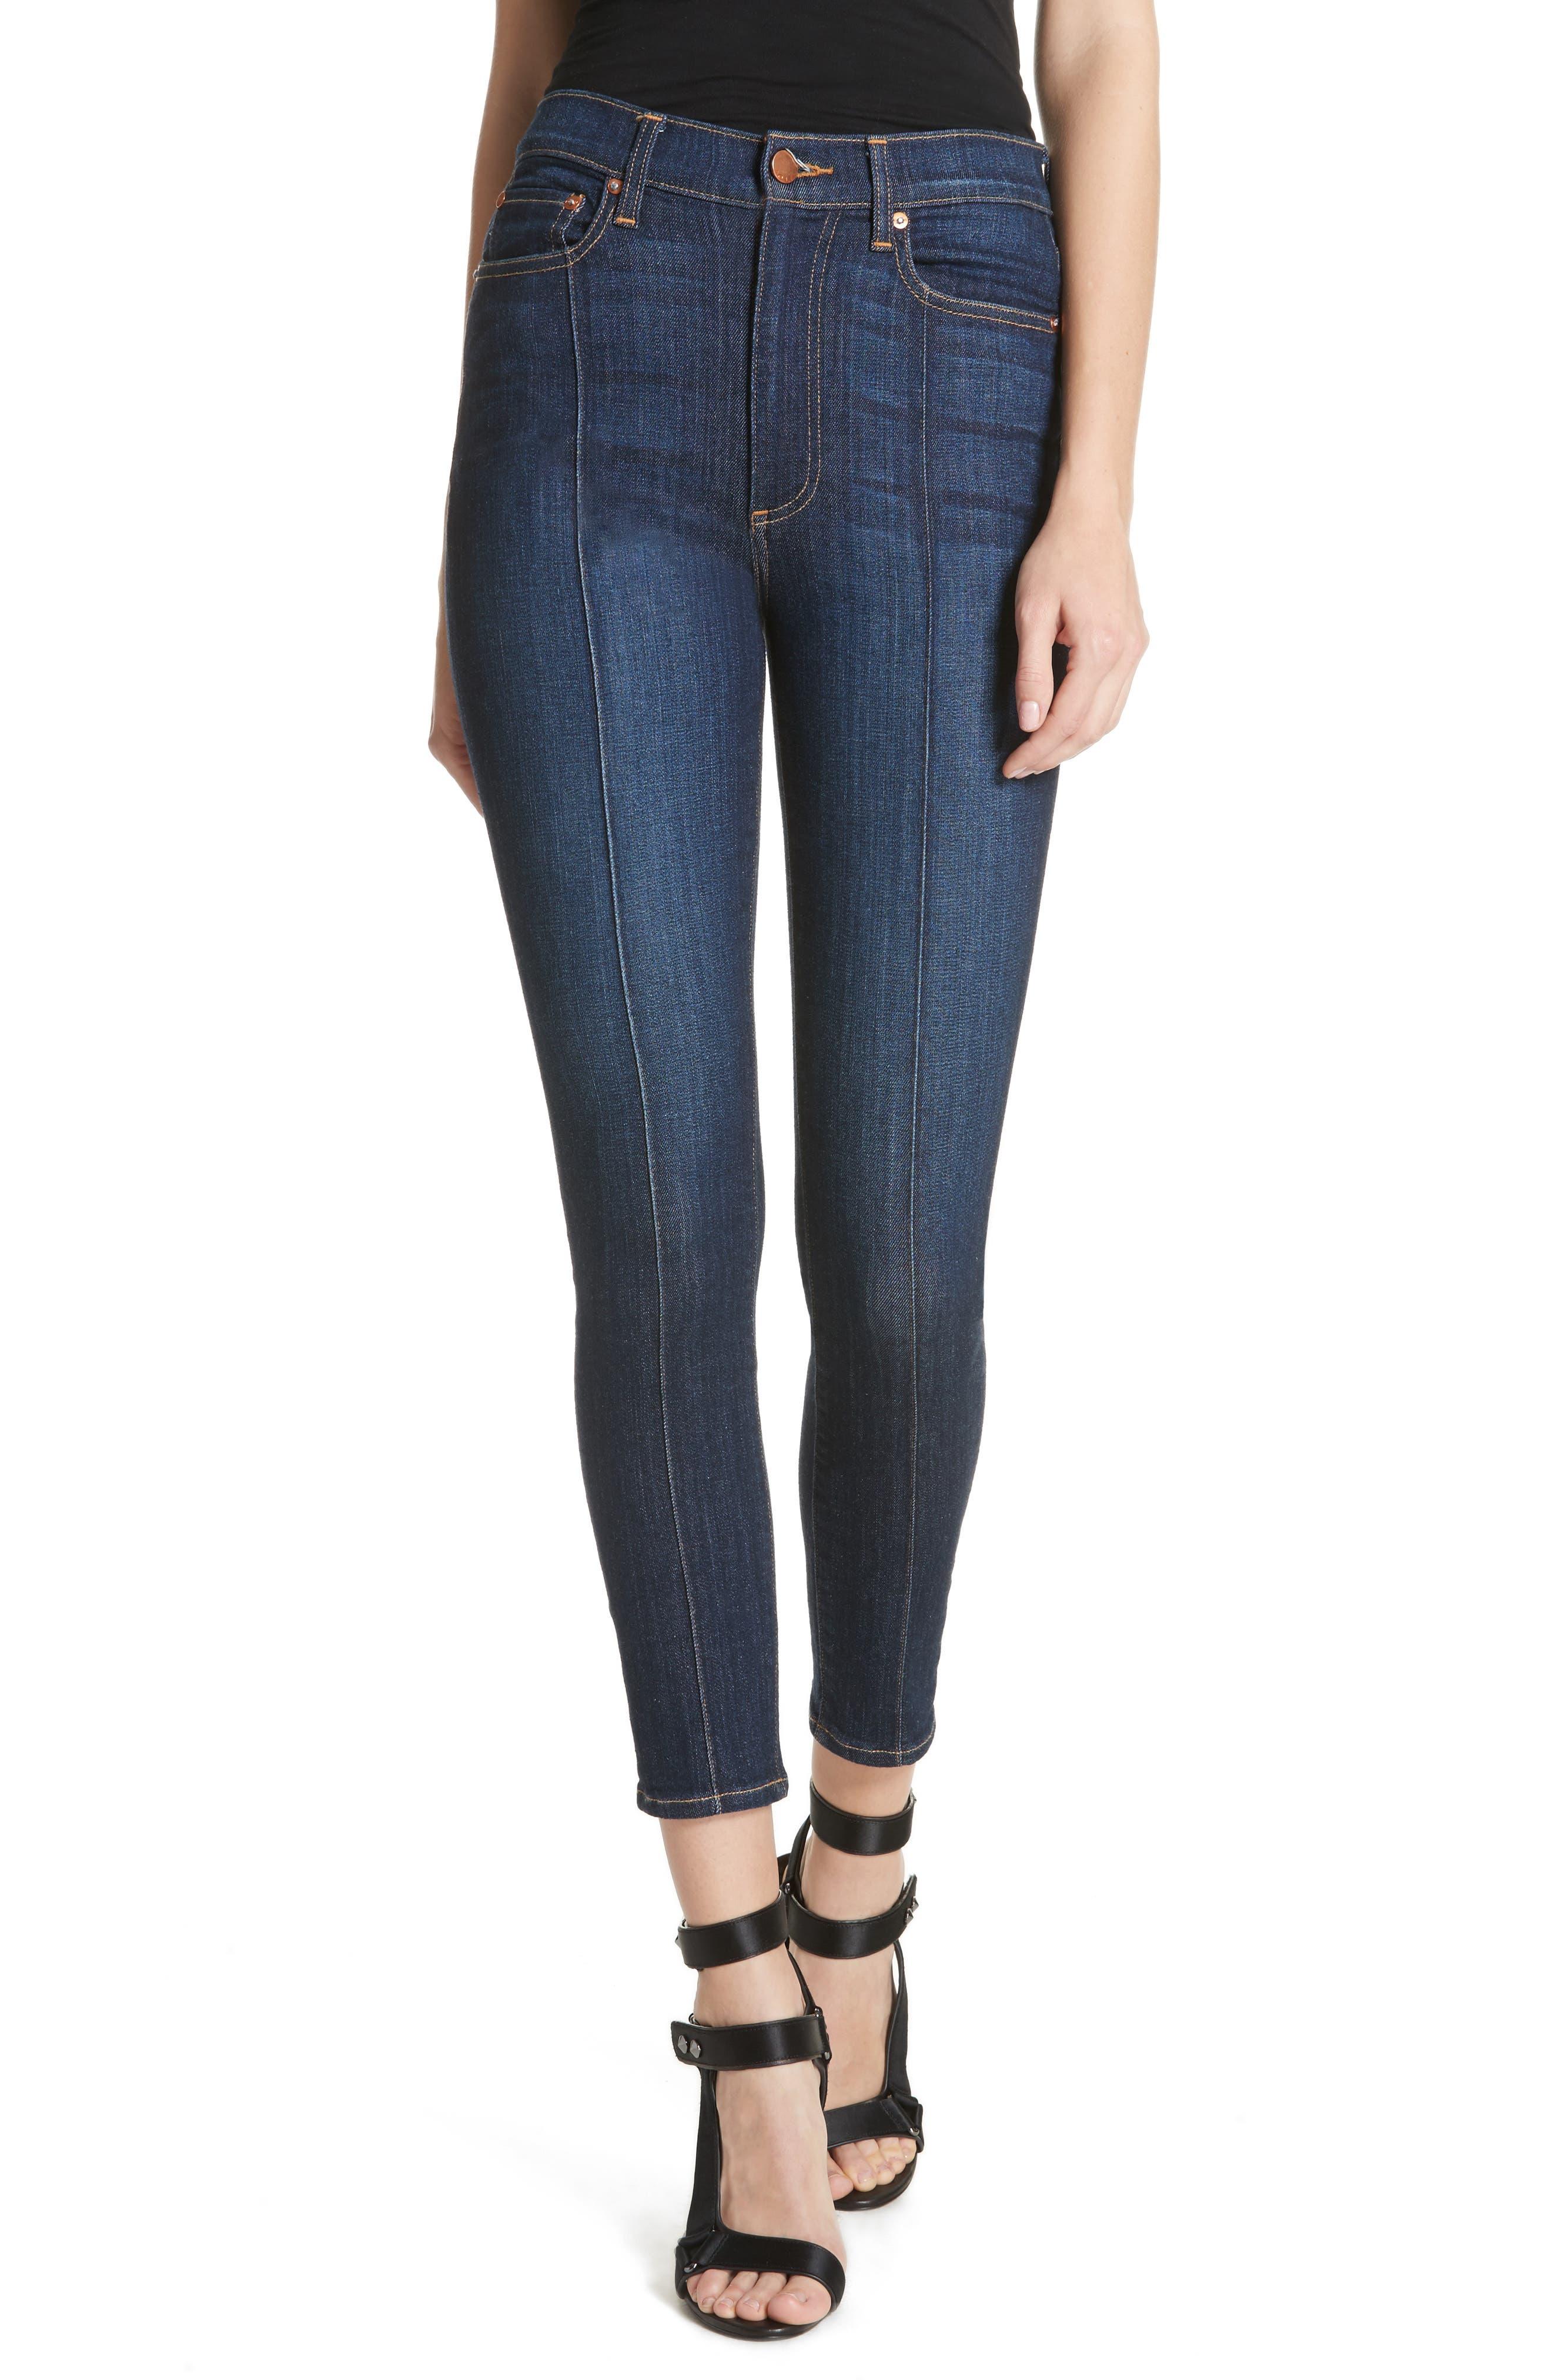 AO.LA Good High Waist Pintuck Skinny Jeans,                             Main thumbnail 1, color,                             Dream On